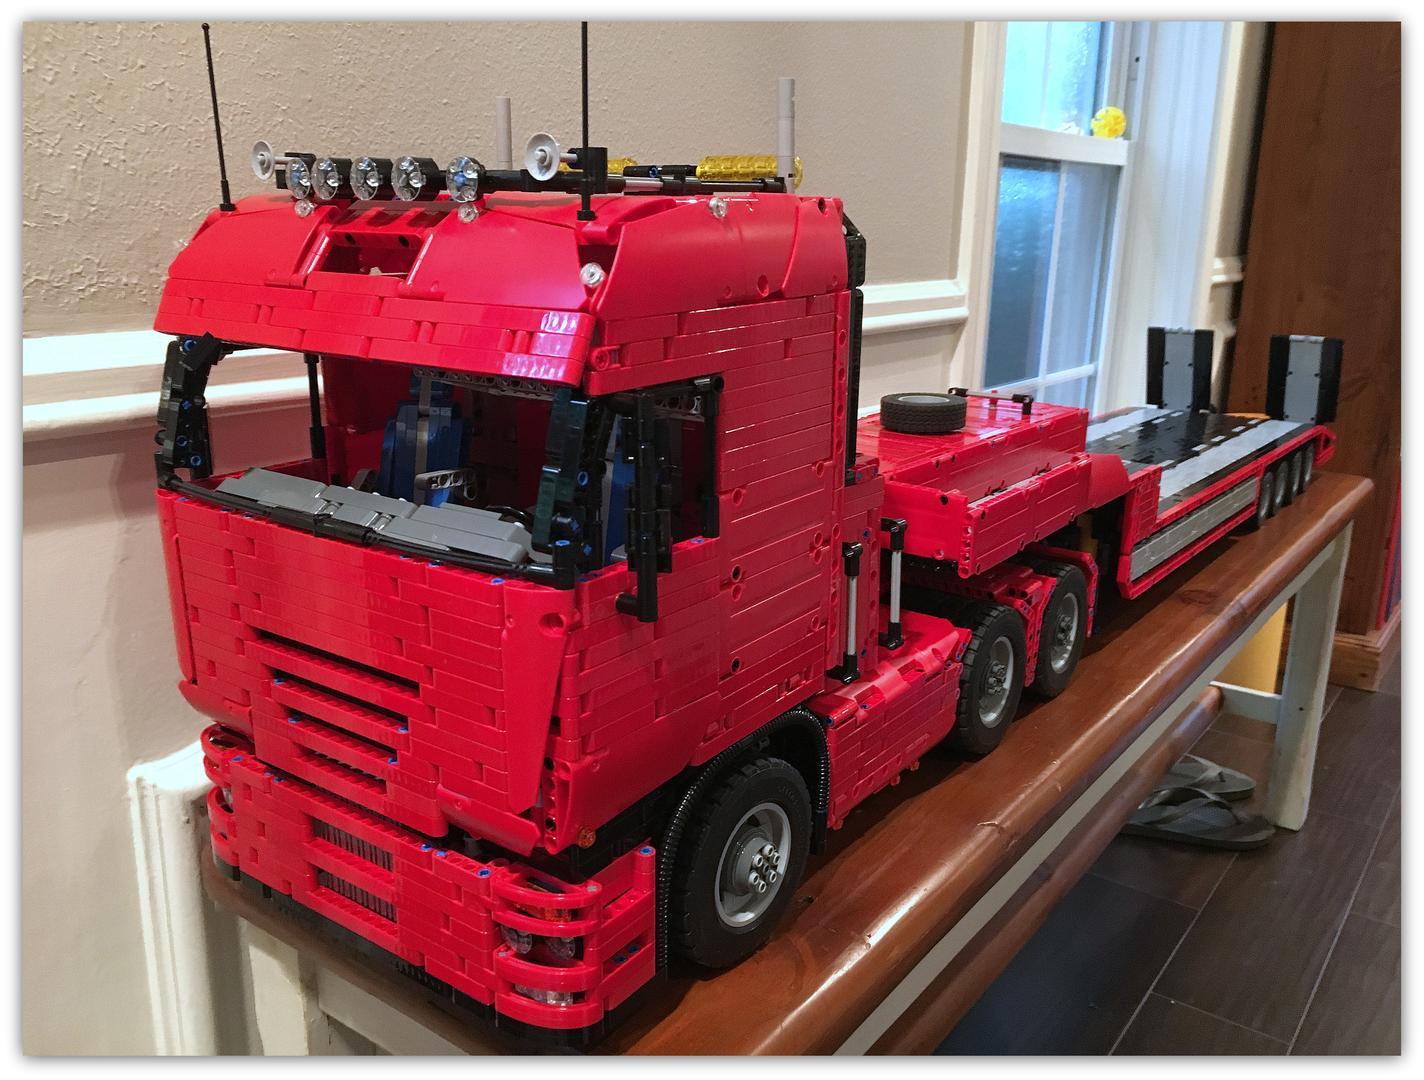 Lego Moc 2475 Tractor Truck Technic Gt Model Gt Traffic